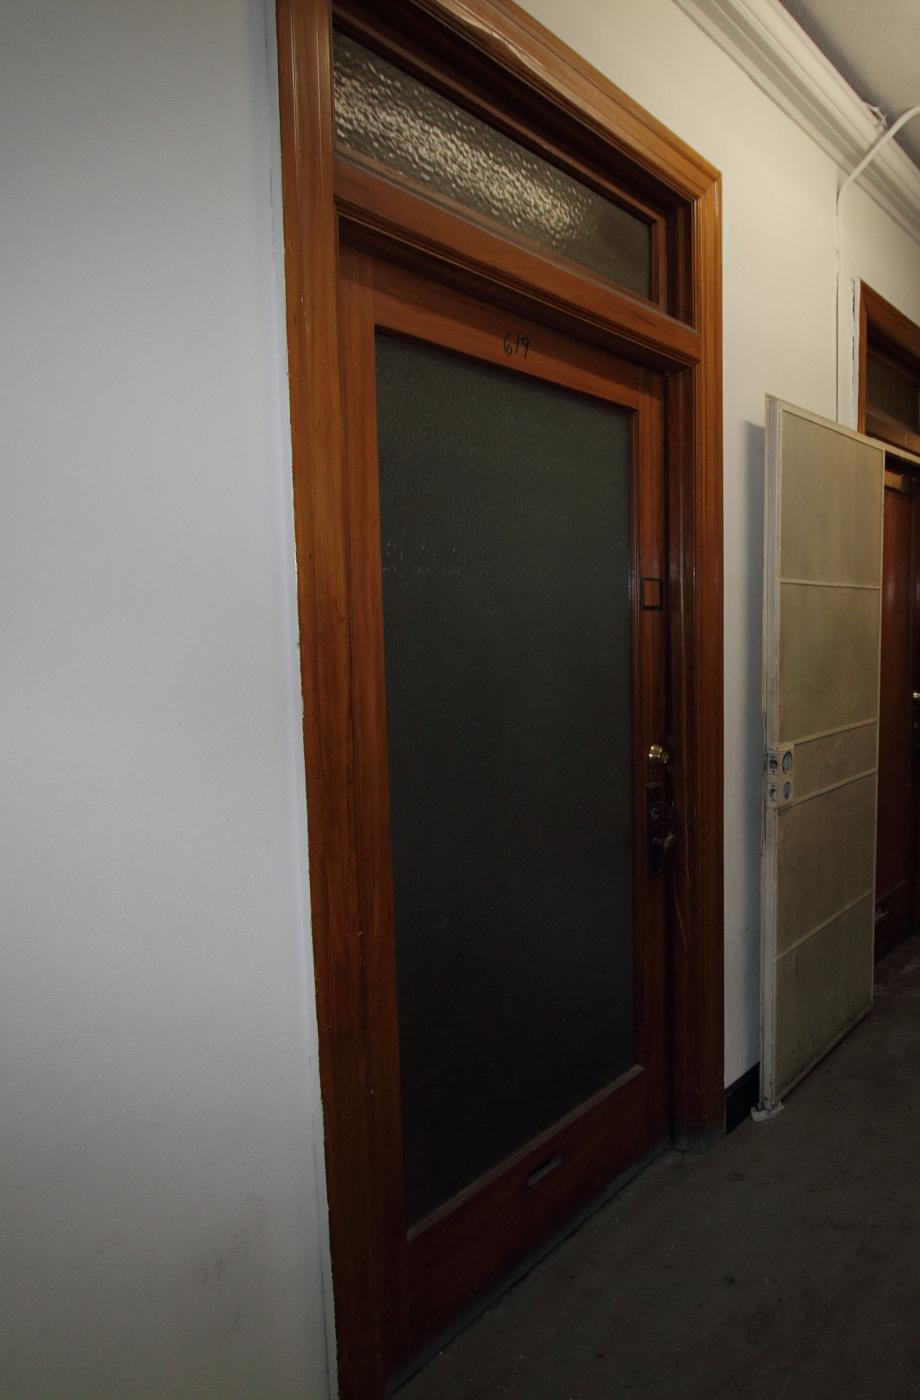 Original 1925 office door with transom, before rehabilitation.